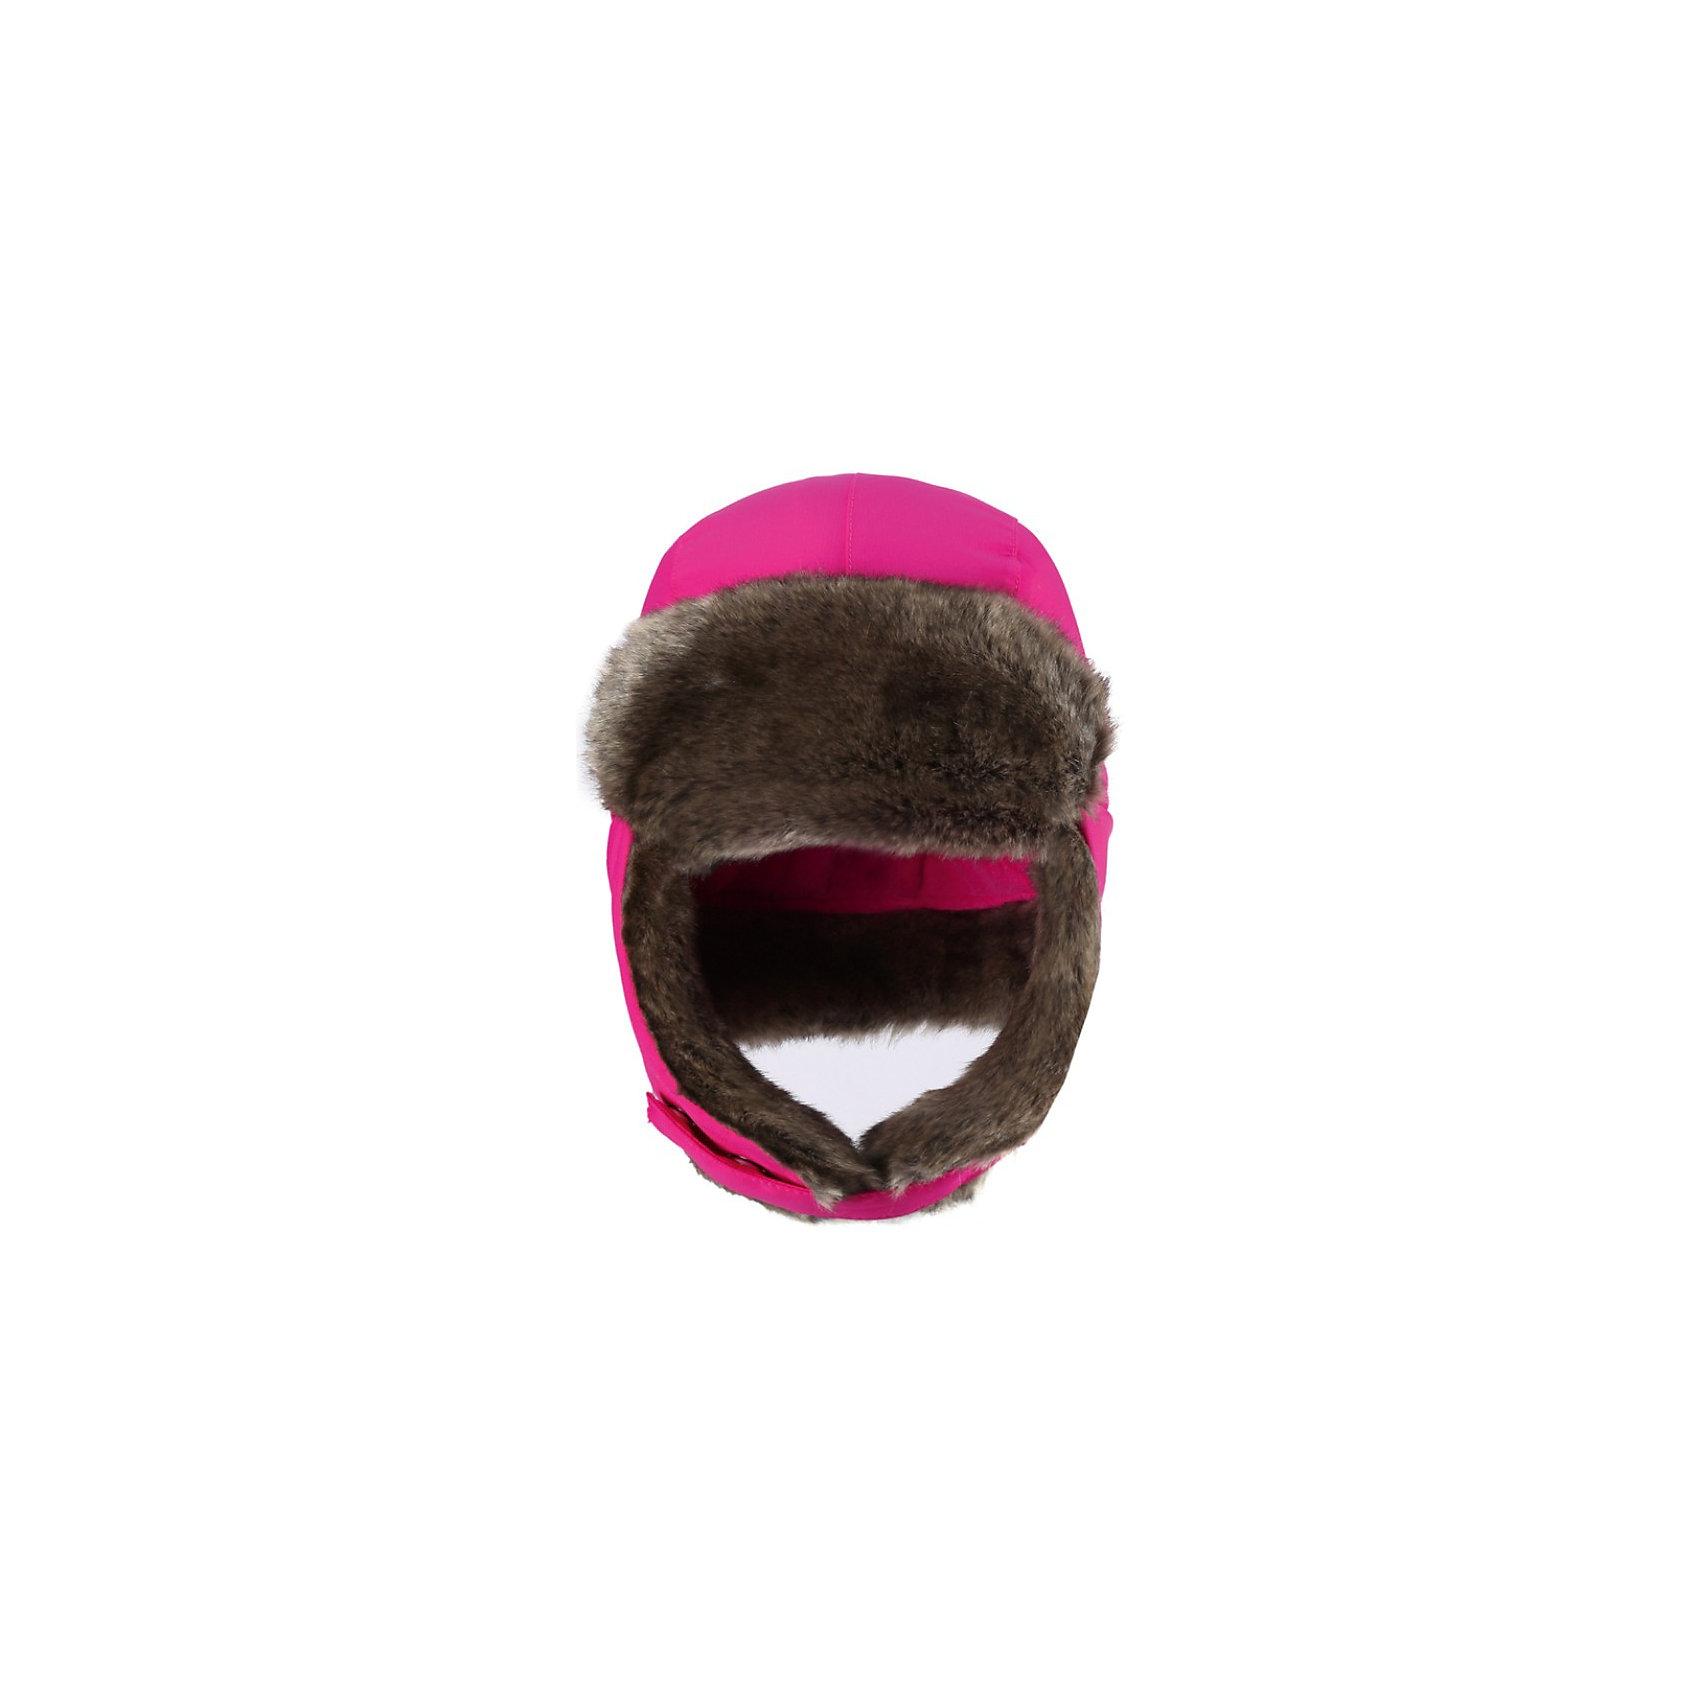 Reima Шапка для девочки Reimatec® Reima reima сапоги slate для мальчика reimatec® reima